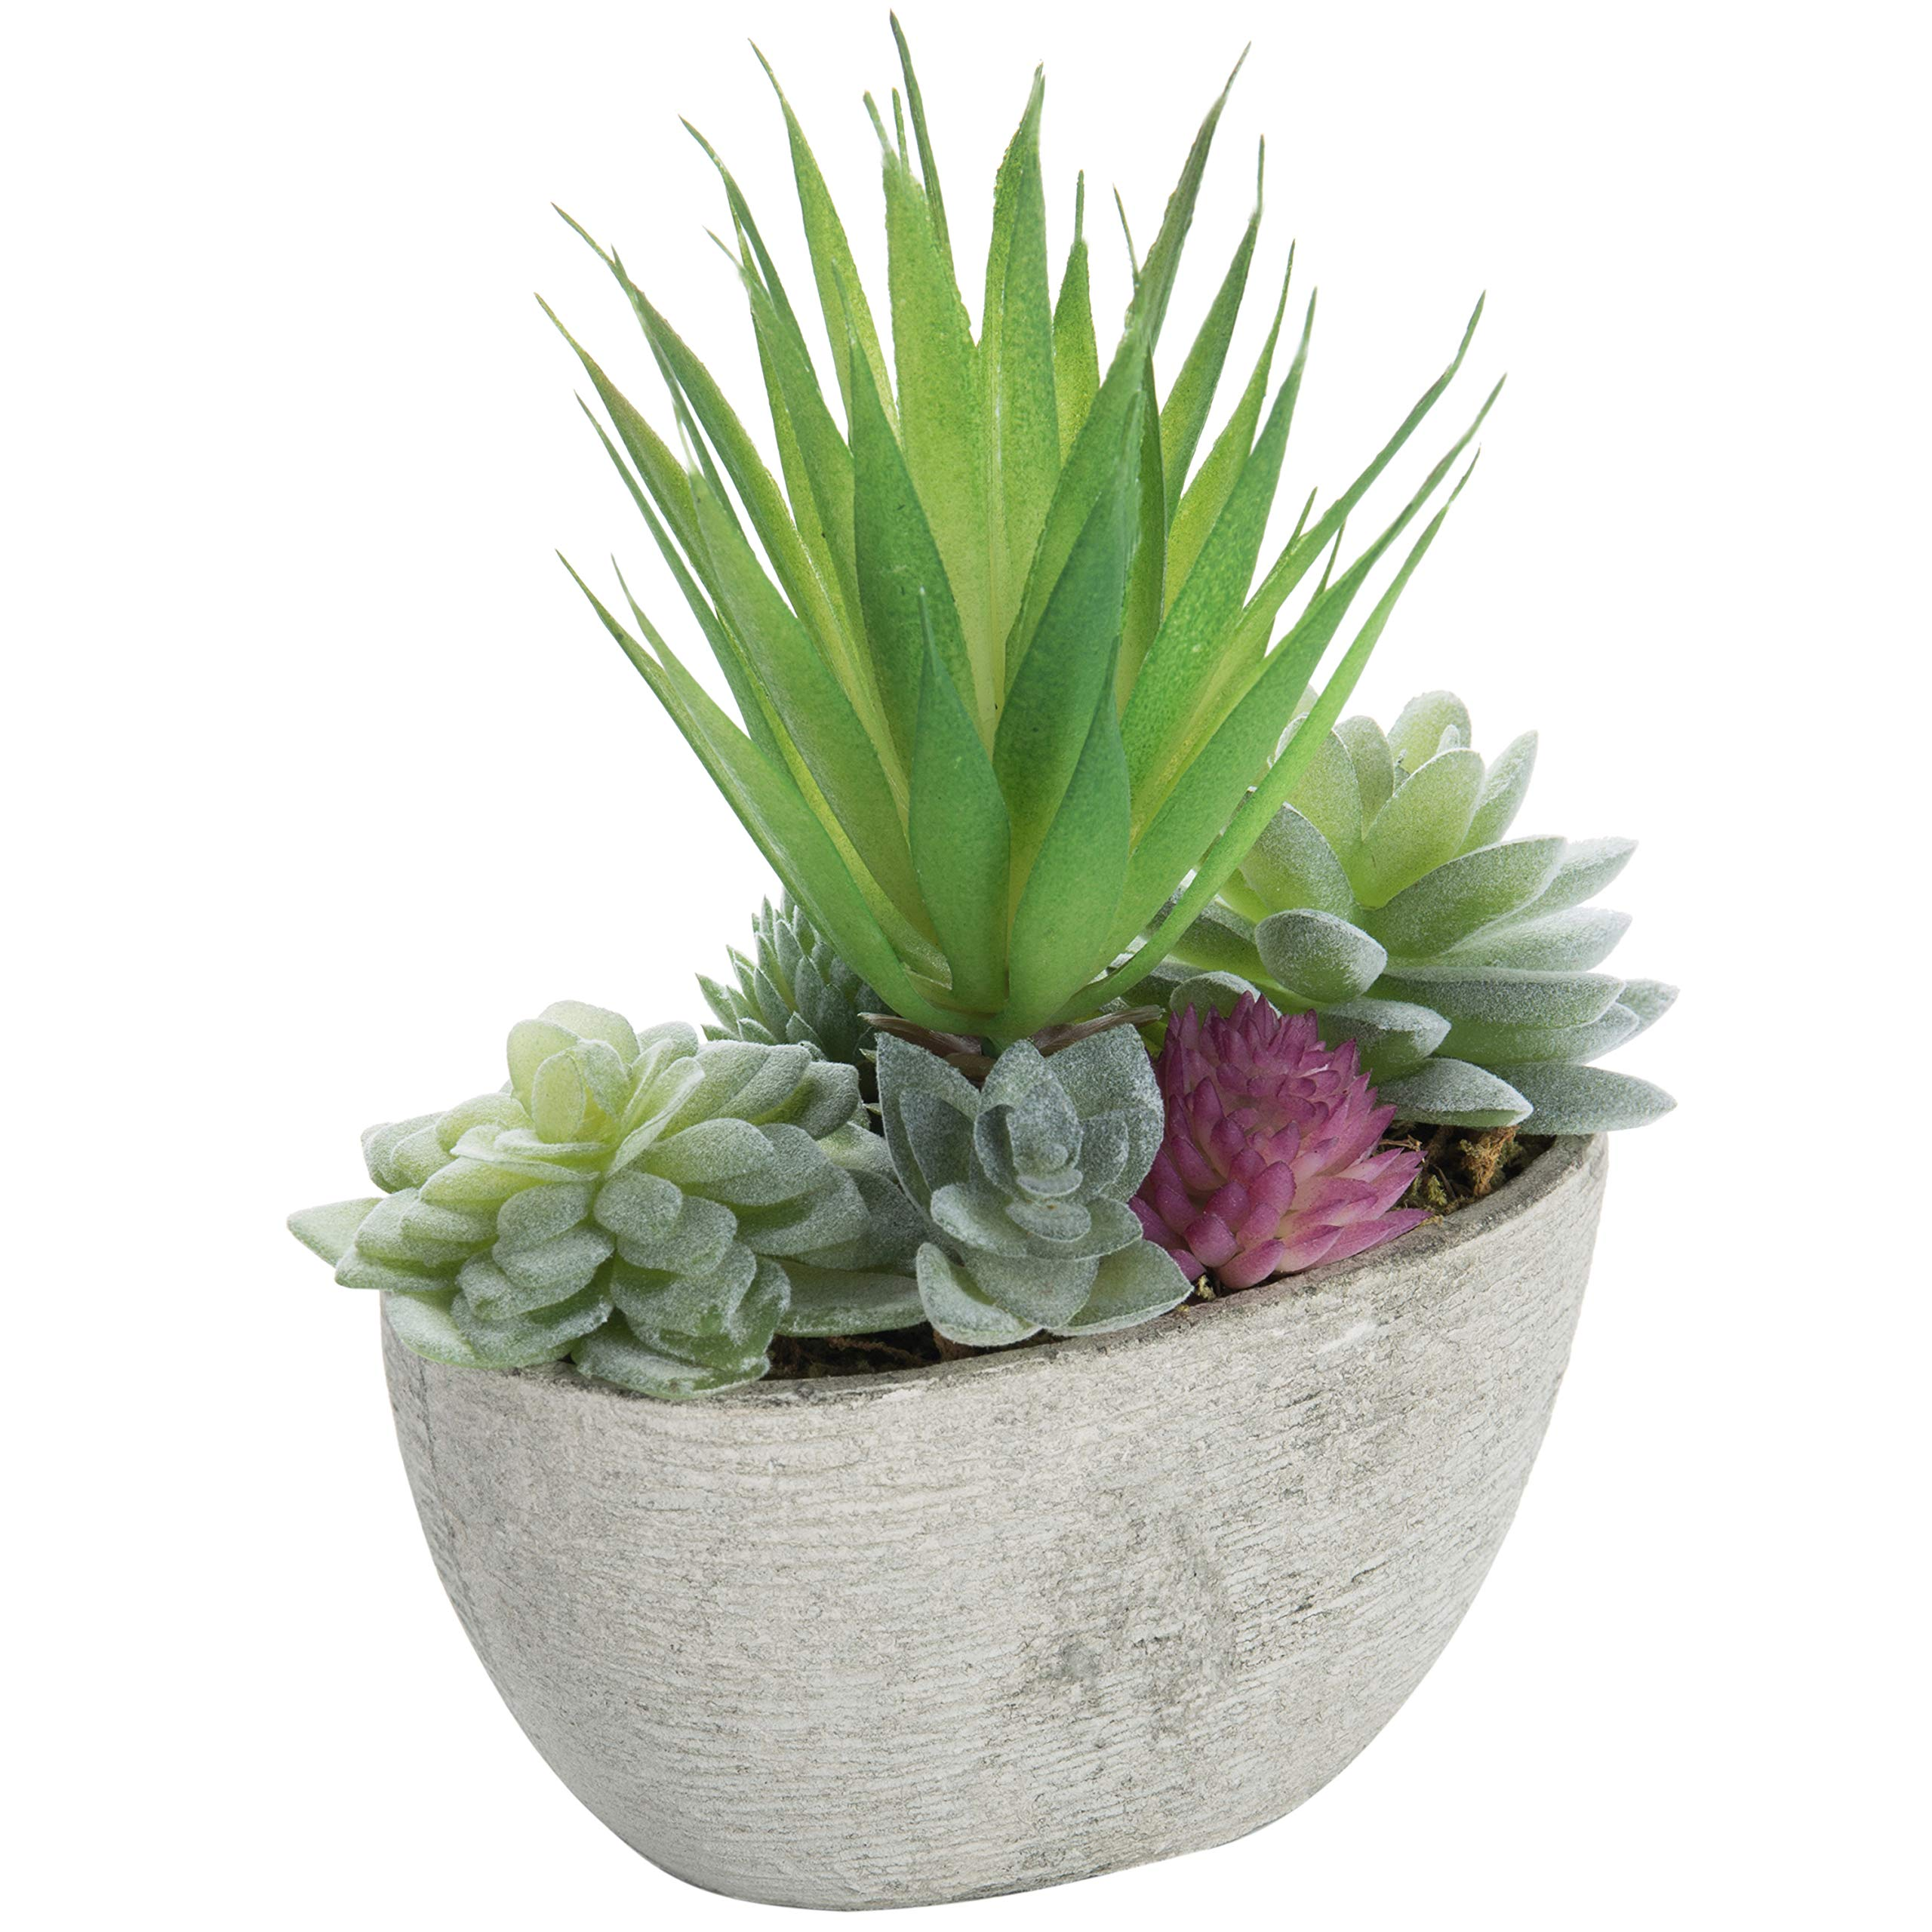 MyGift Miniature Faux Succulent Arrangment in Cement-Gray Pulp Planter